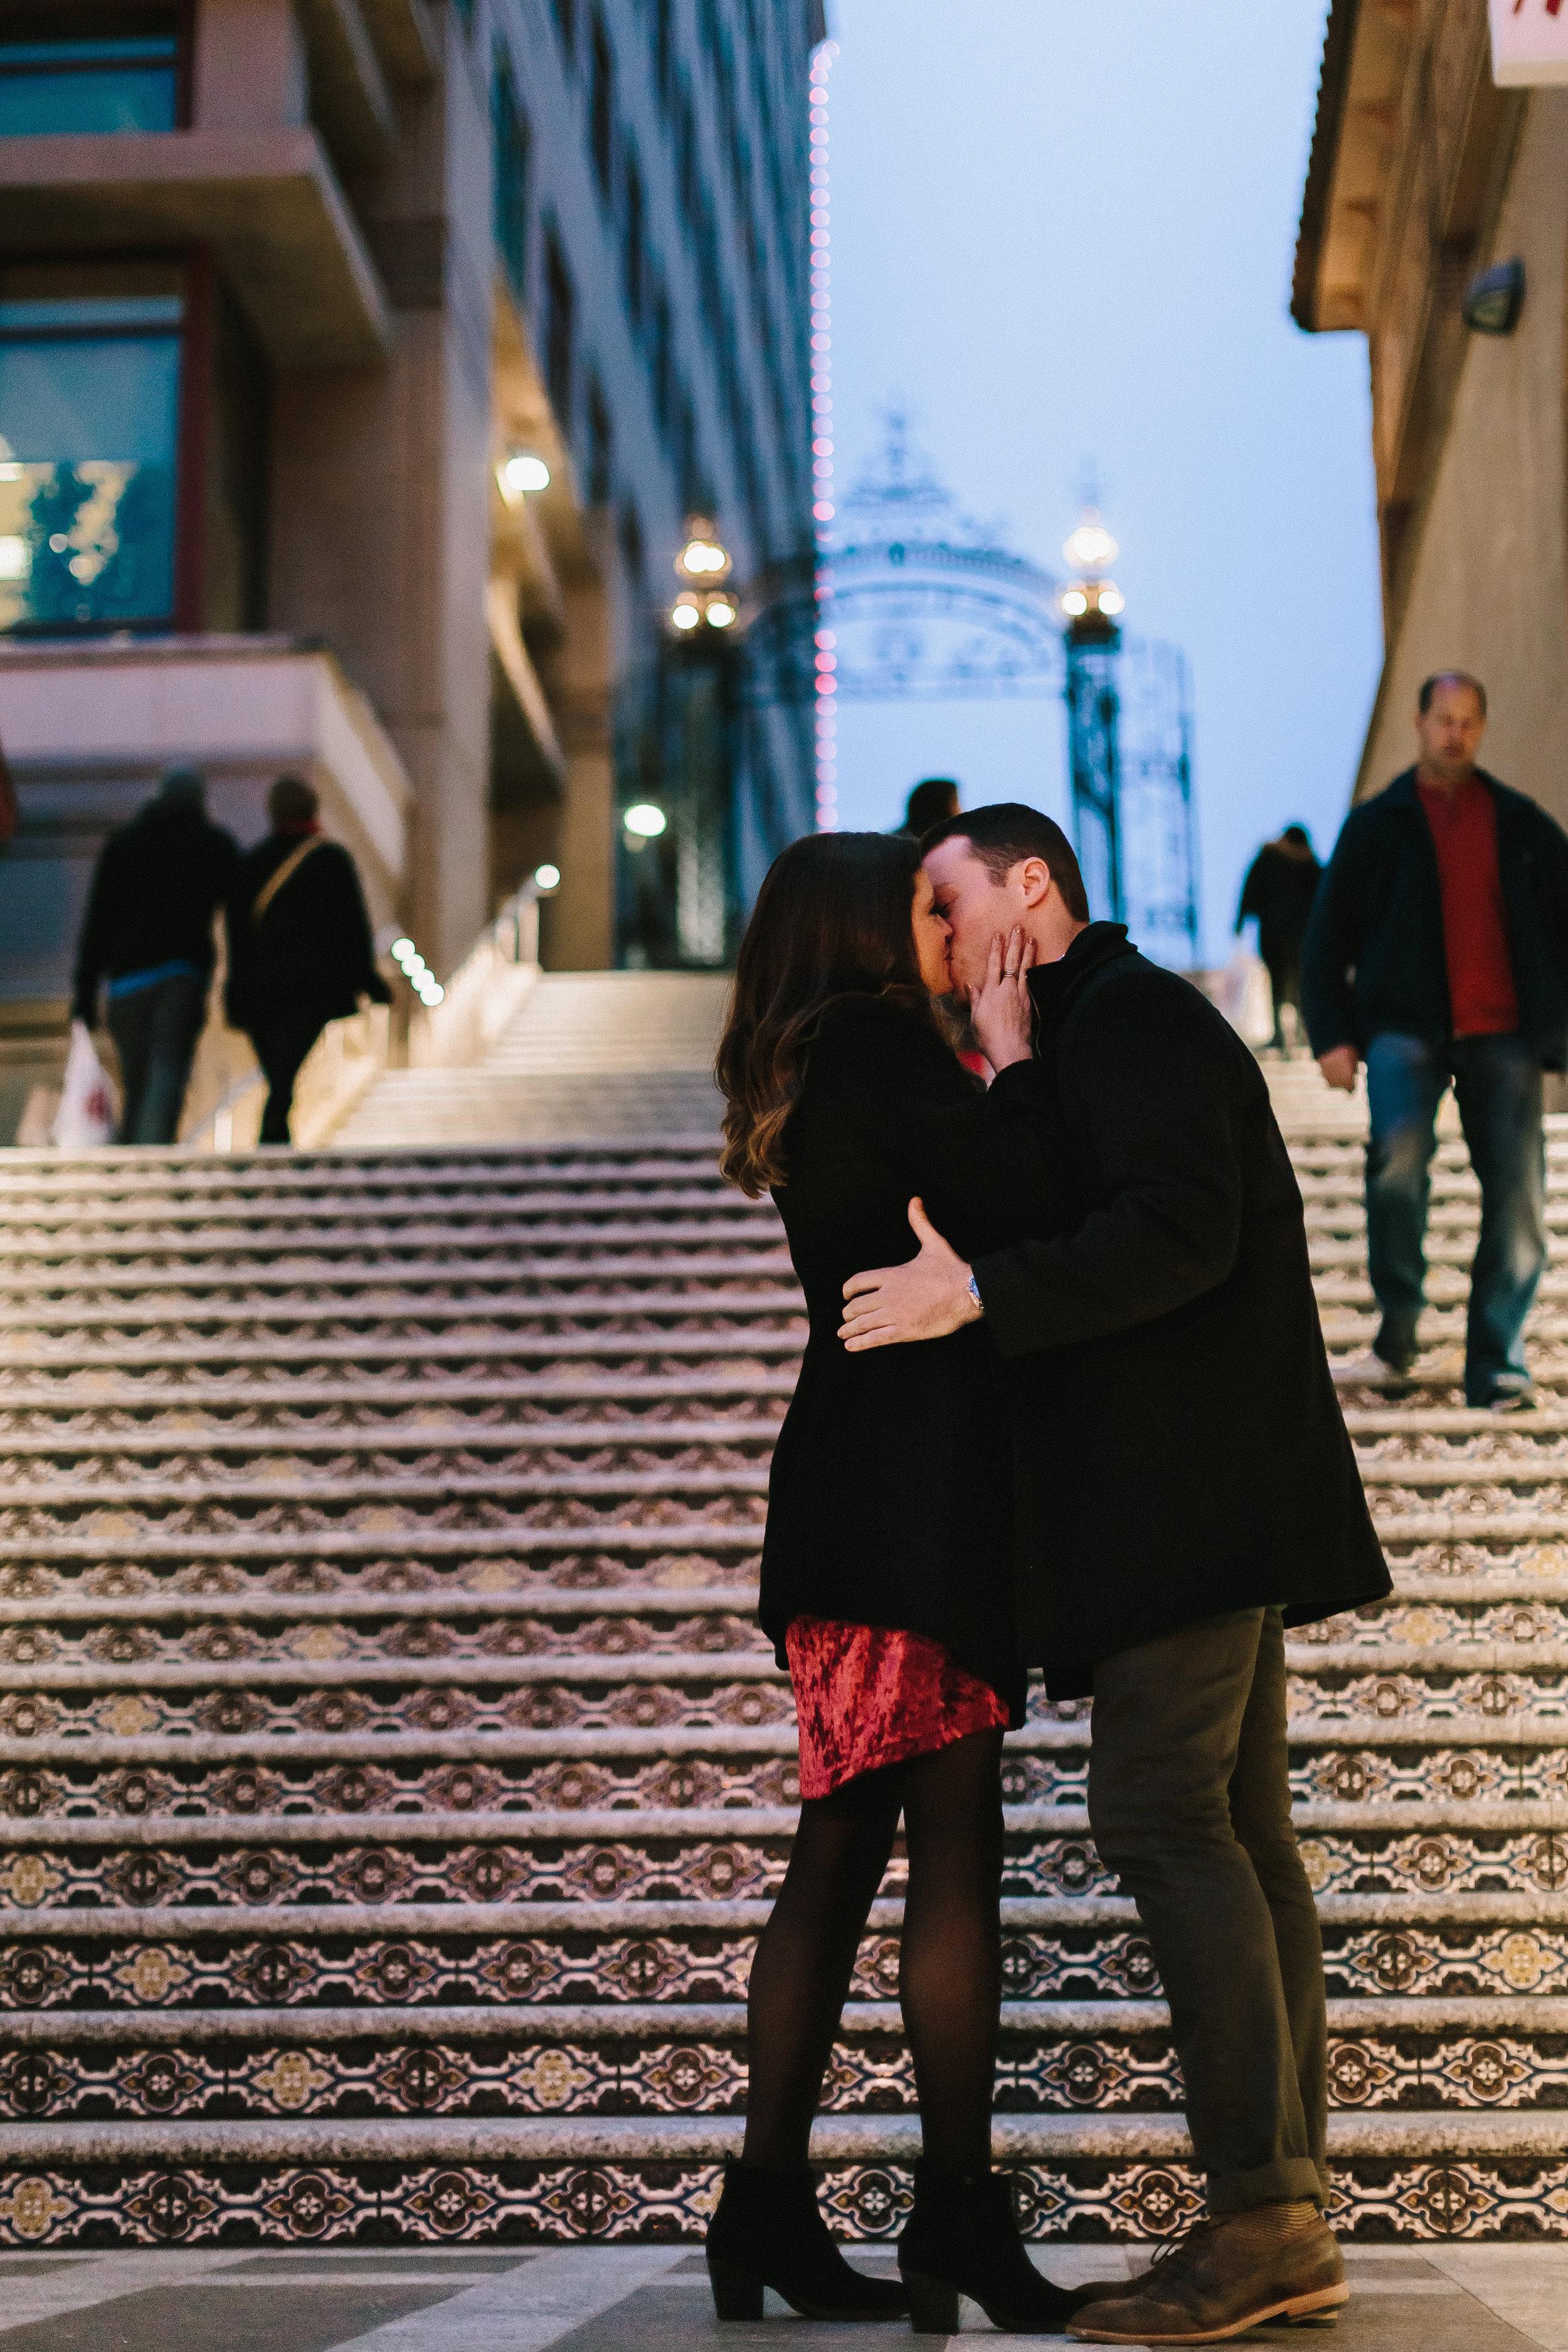 alyssa barletter photography christmas winter wedding proposal plaza lights plaza stairs she said yes-4.jpg